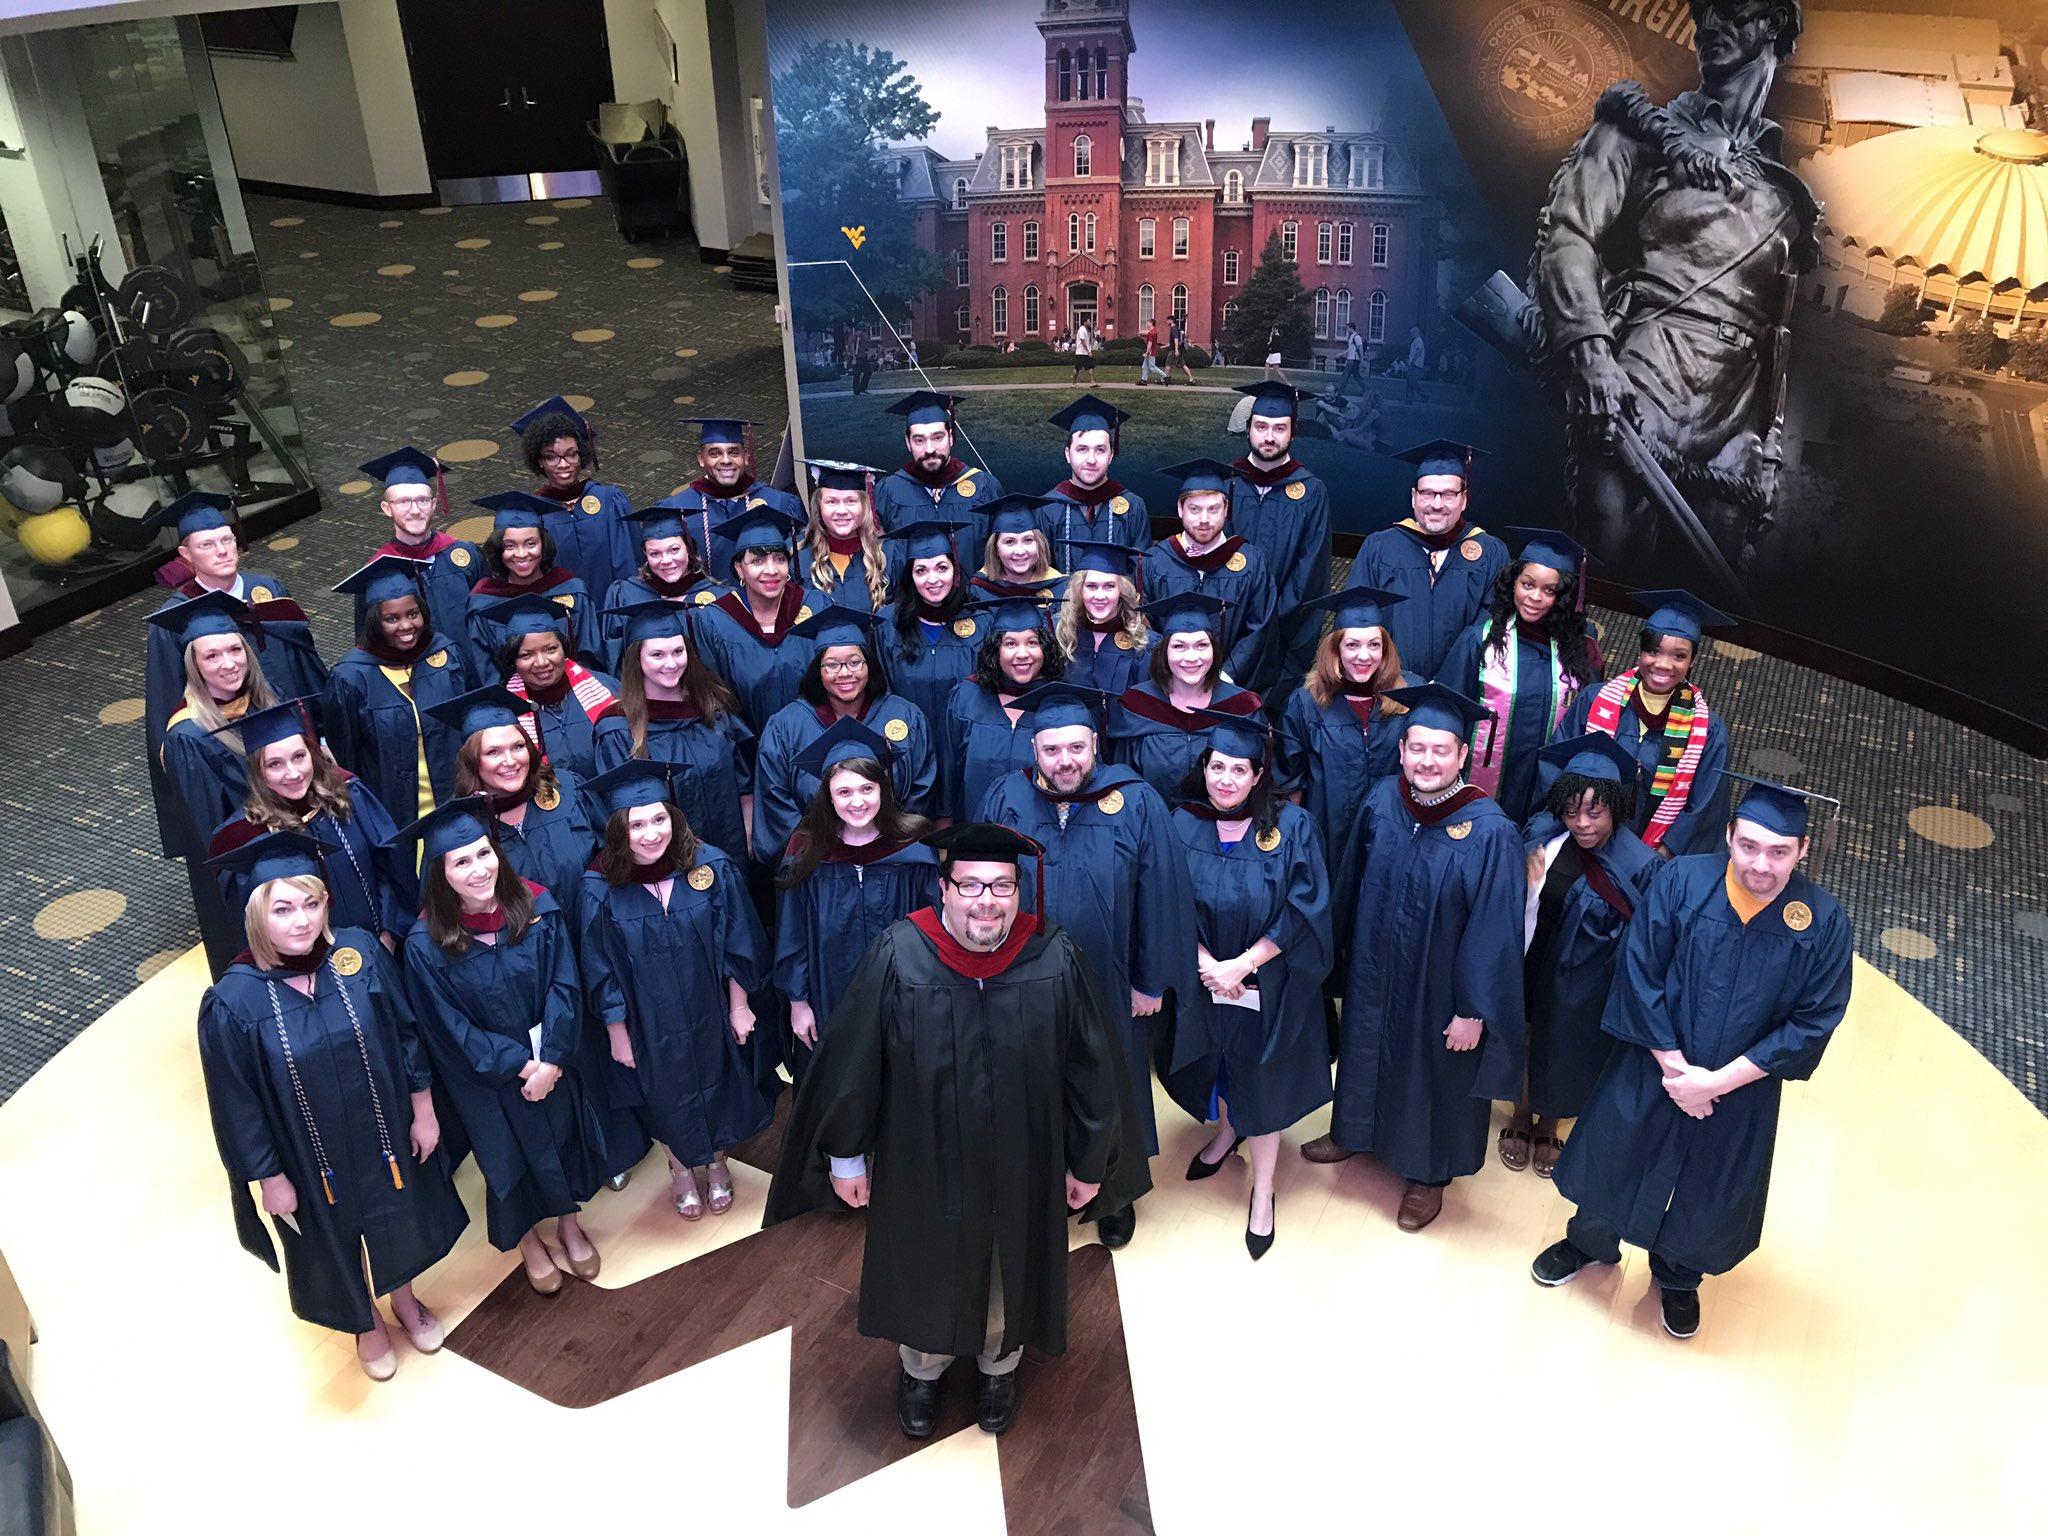 Congratulations to our IMC grads! #WVUgrad 🎓 https://t.co/LEgTGoXHLD